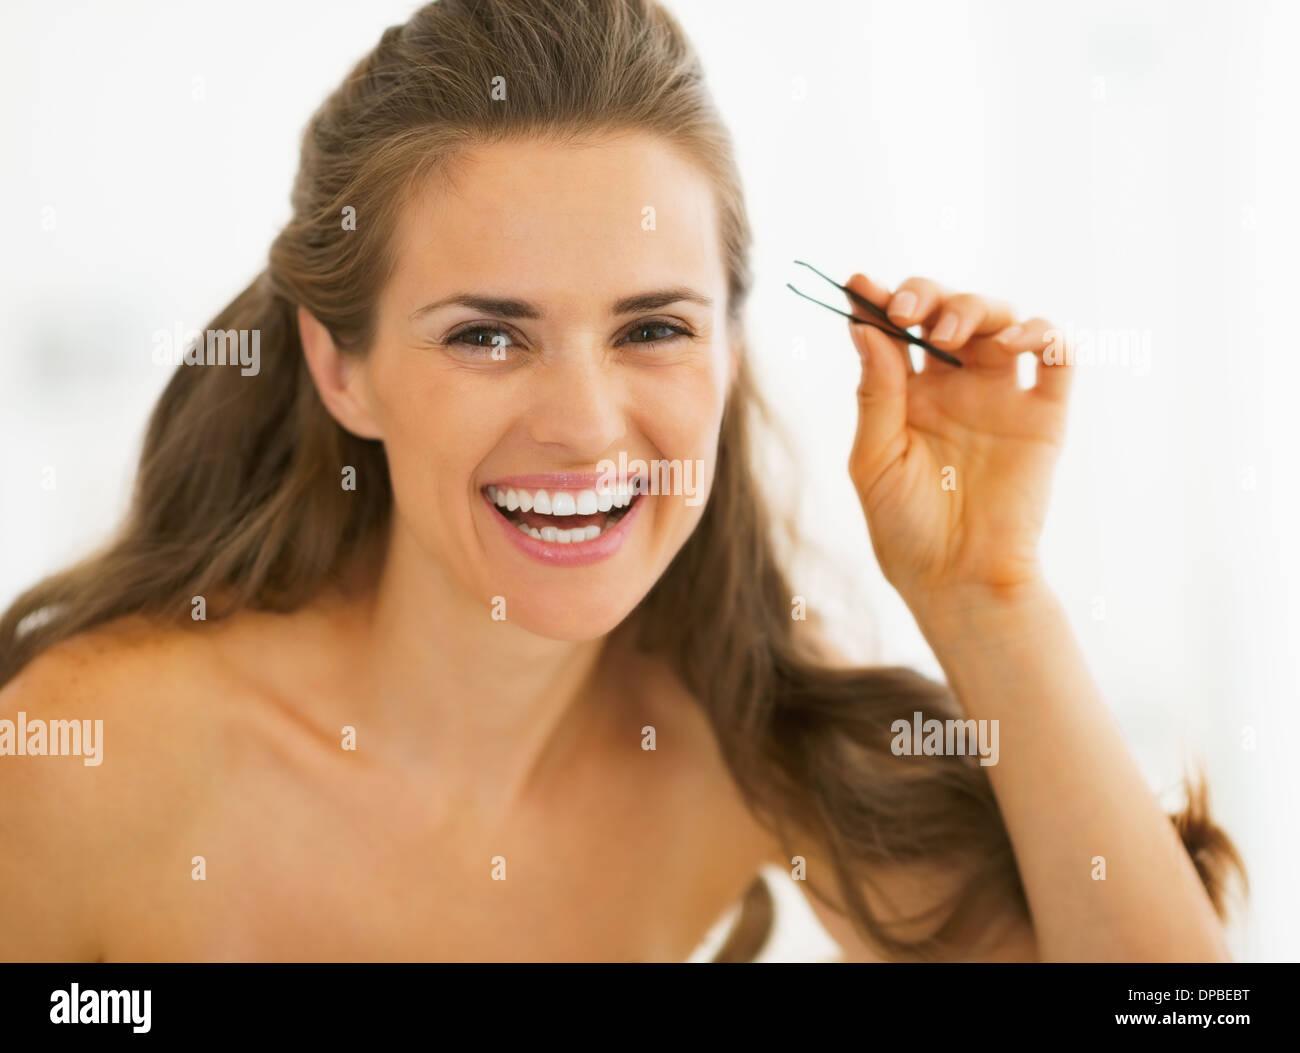 Happy young woman with tweezers - Stock Image